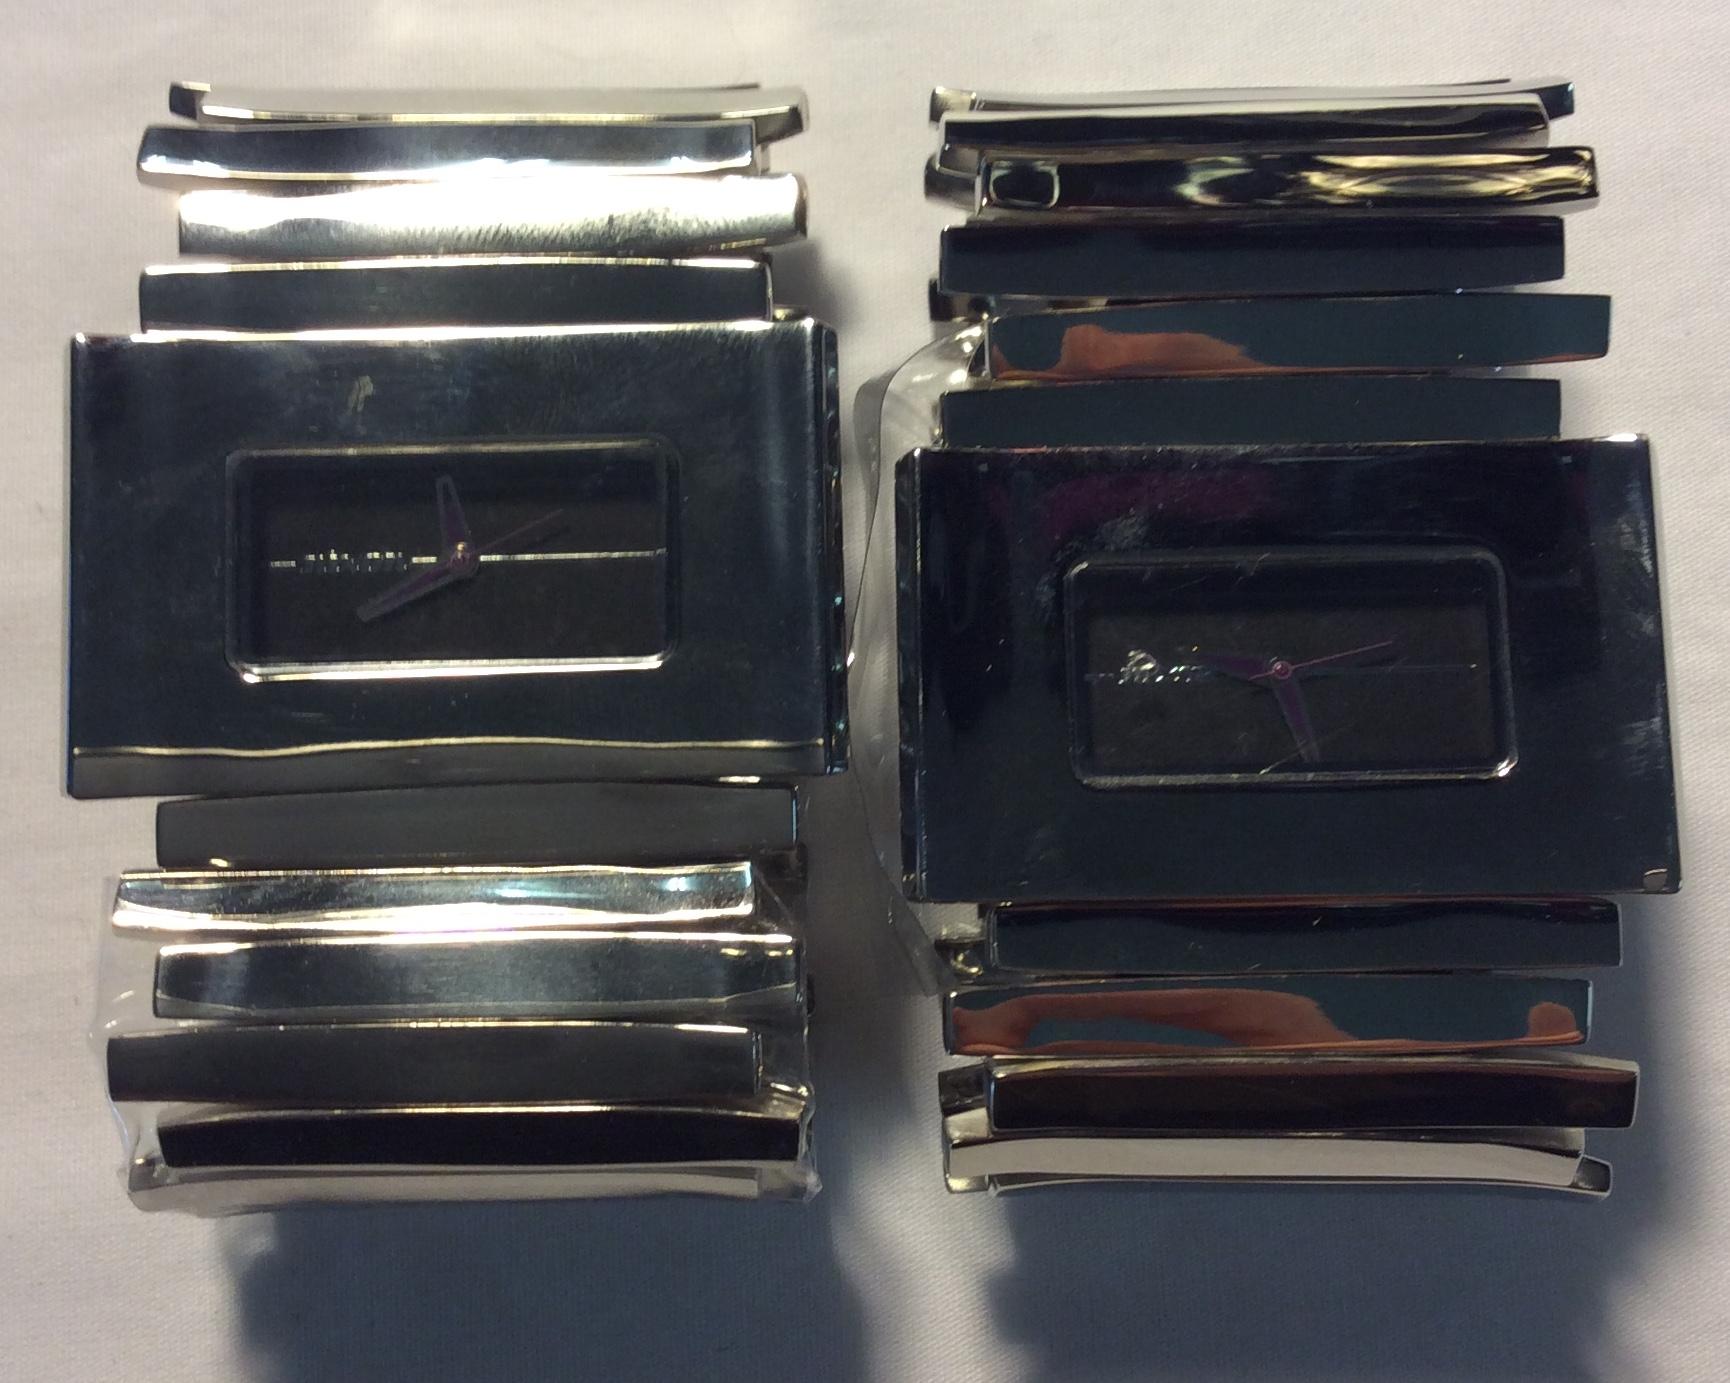 nixon fashion watch - rectangular